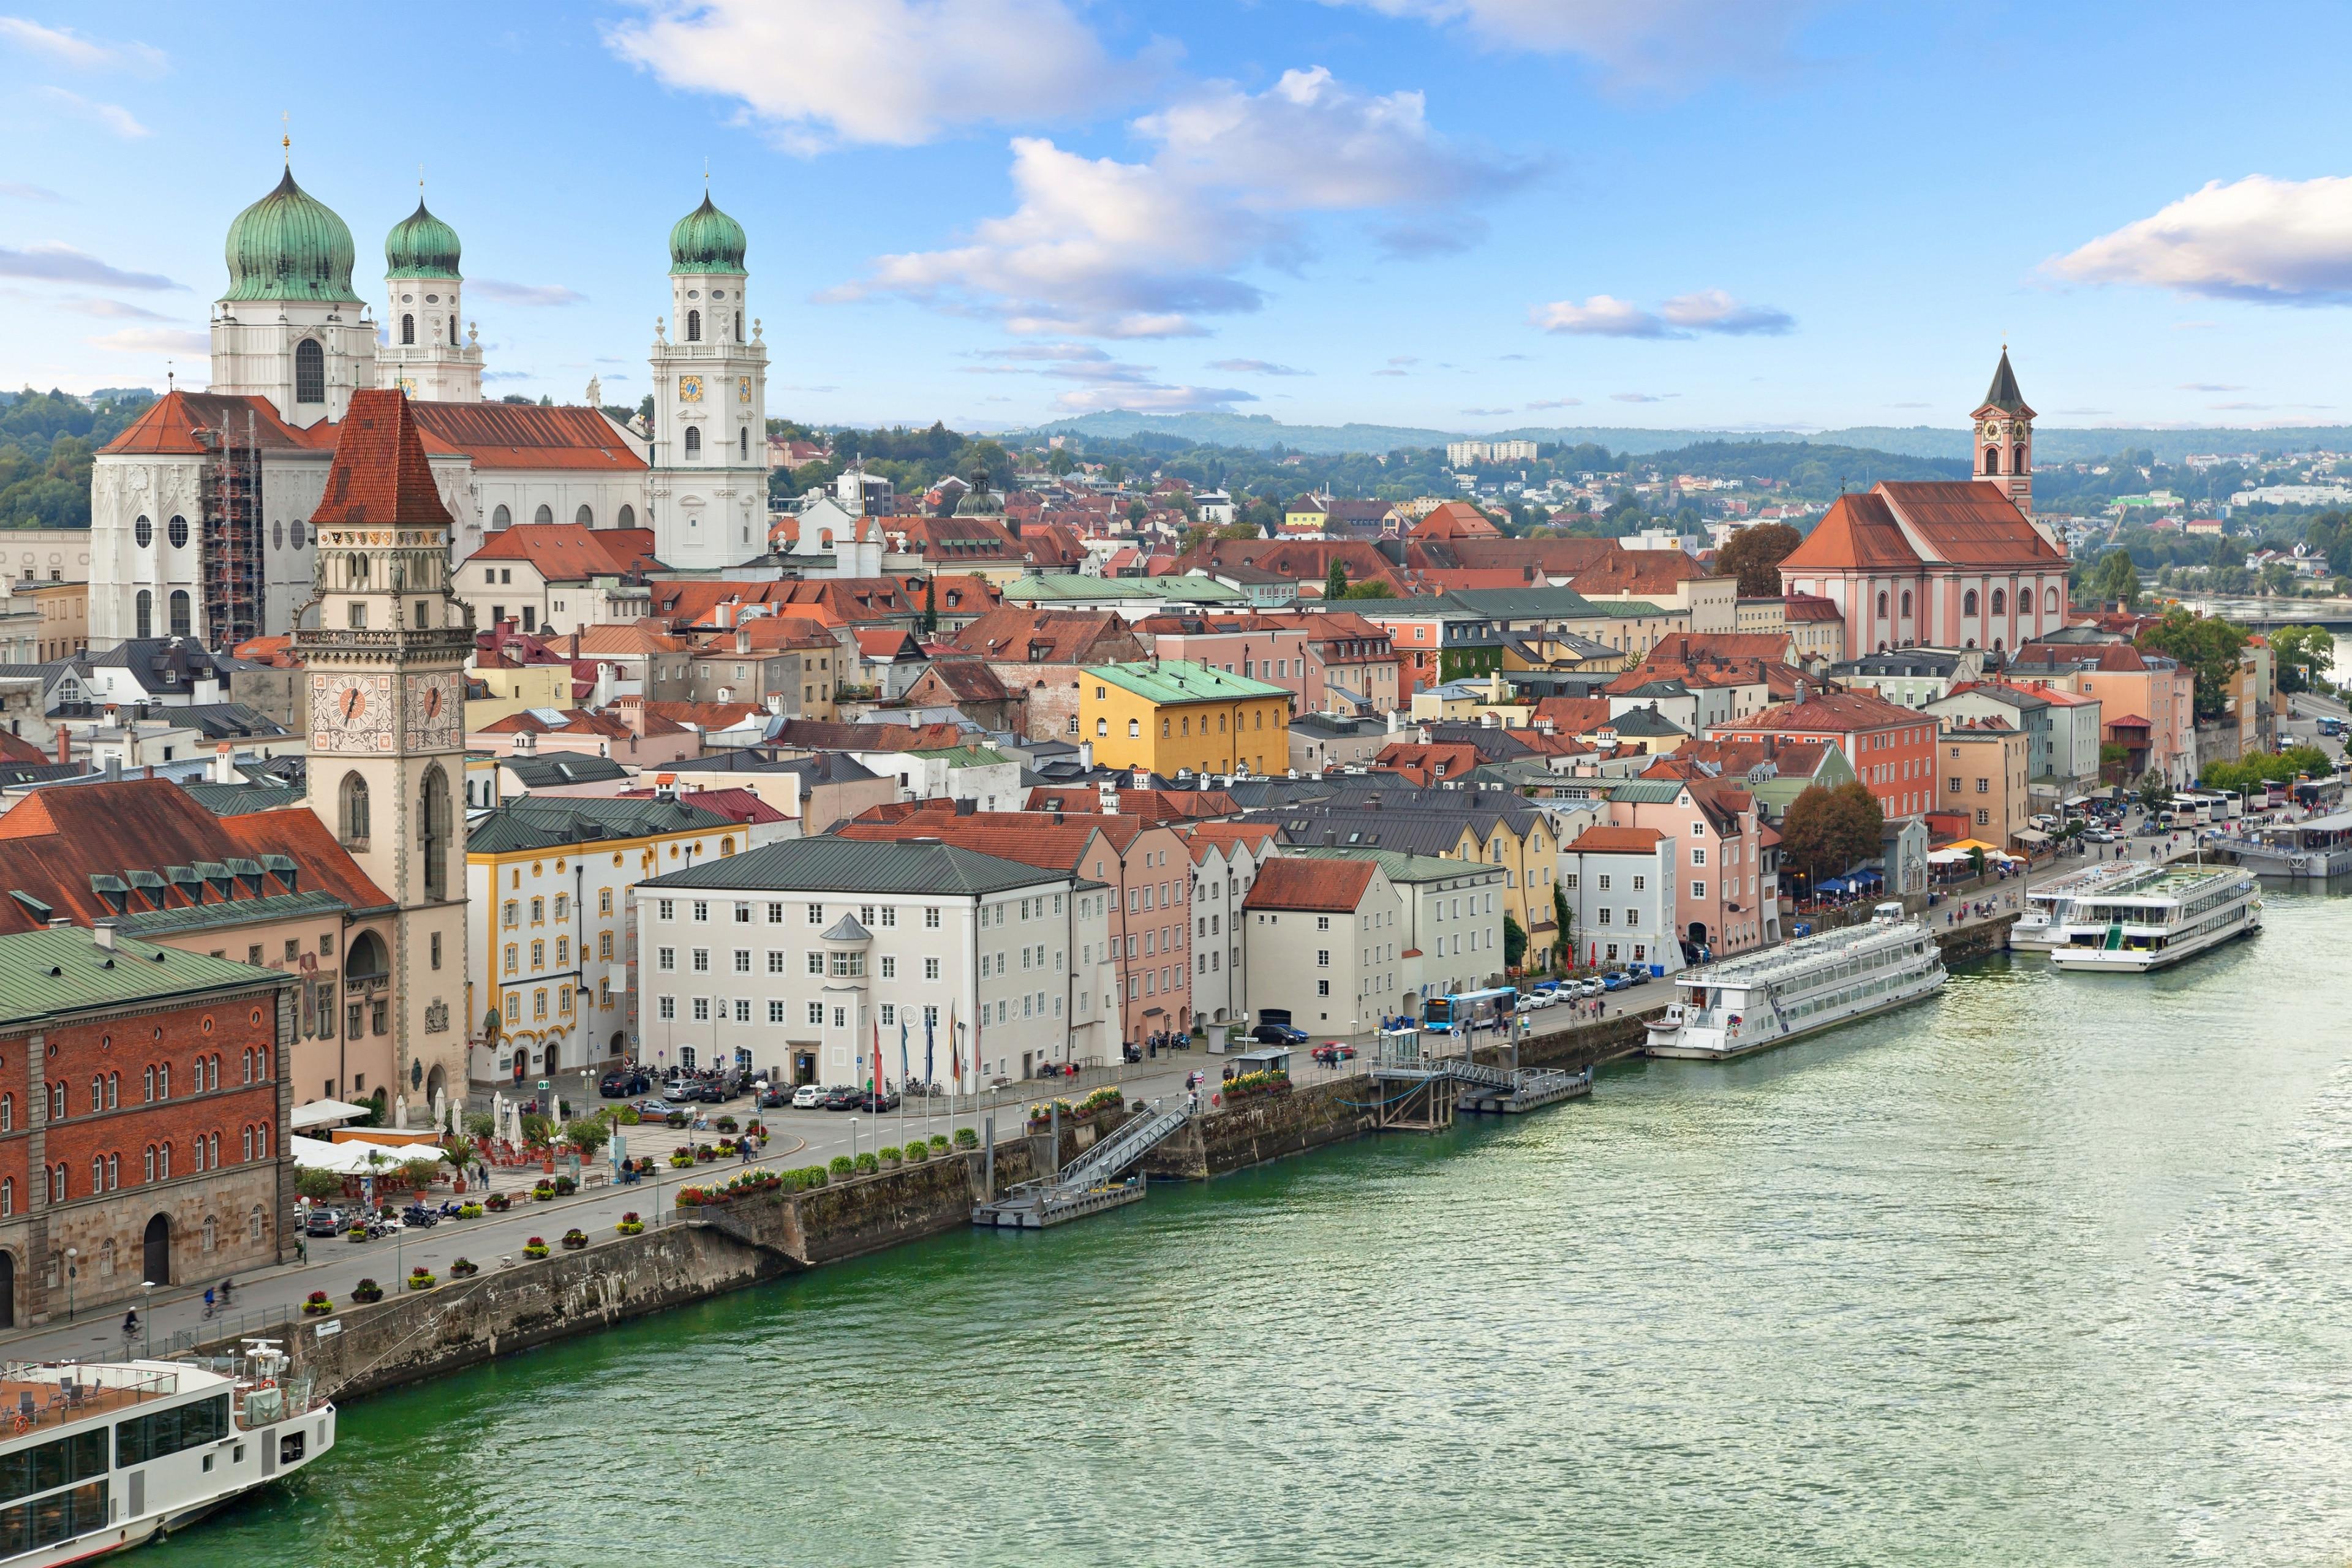 Passau, Nedre Bayern, Bayern, Tyskland